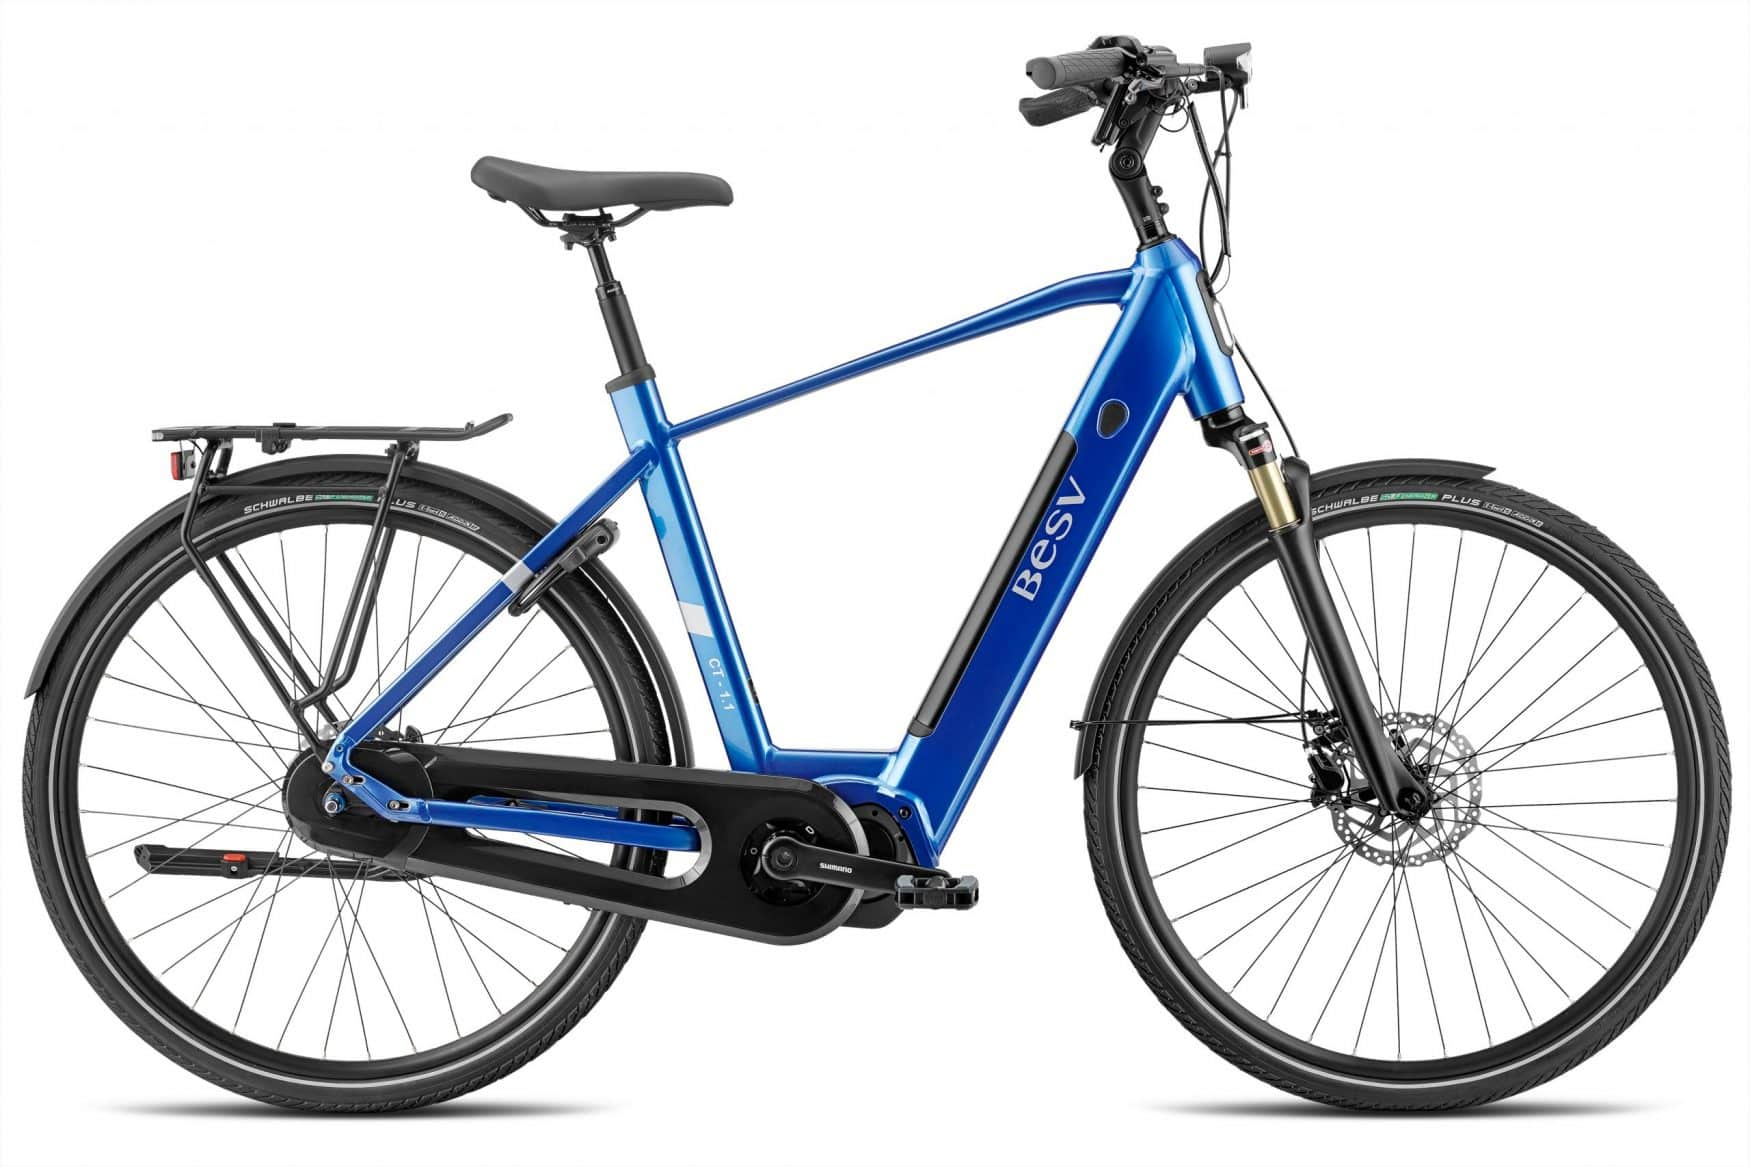 CT 1.1 City e bike | BESV